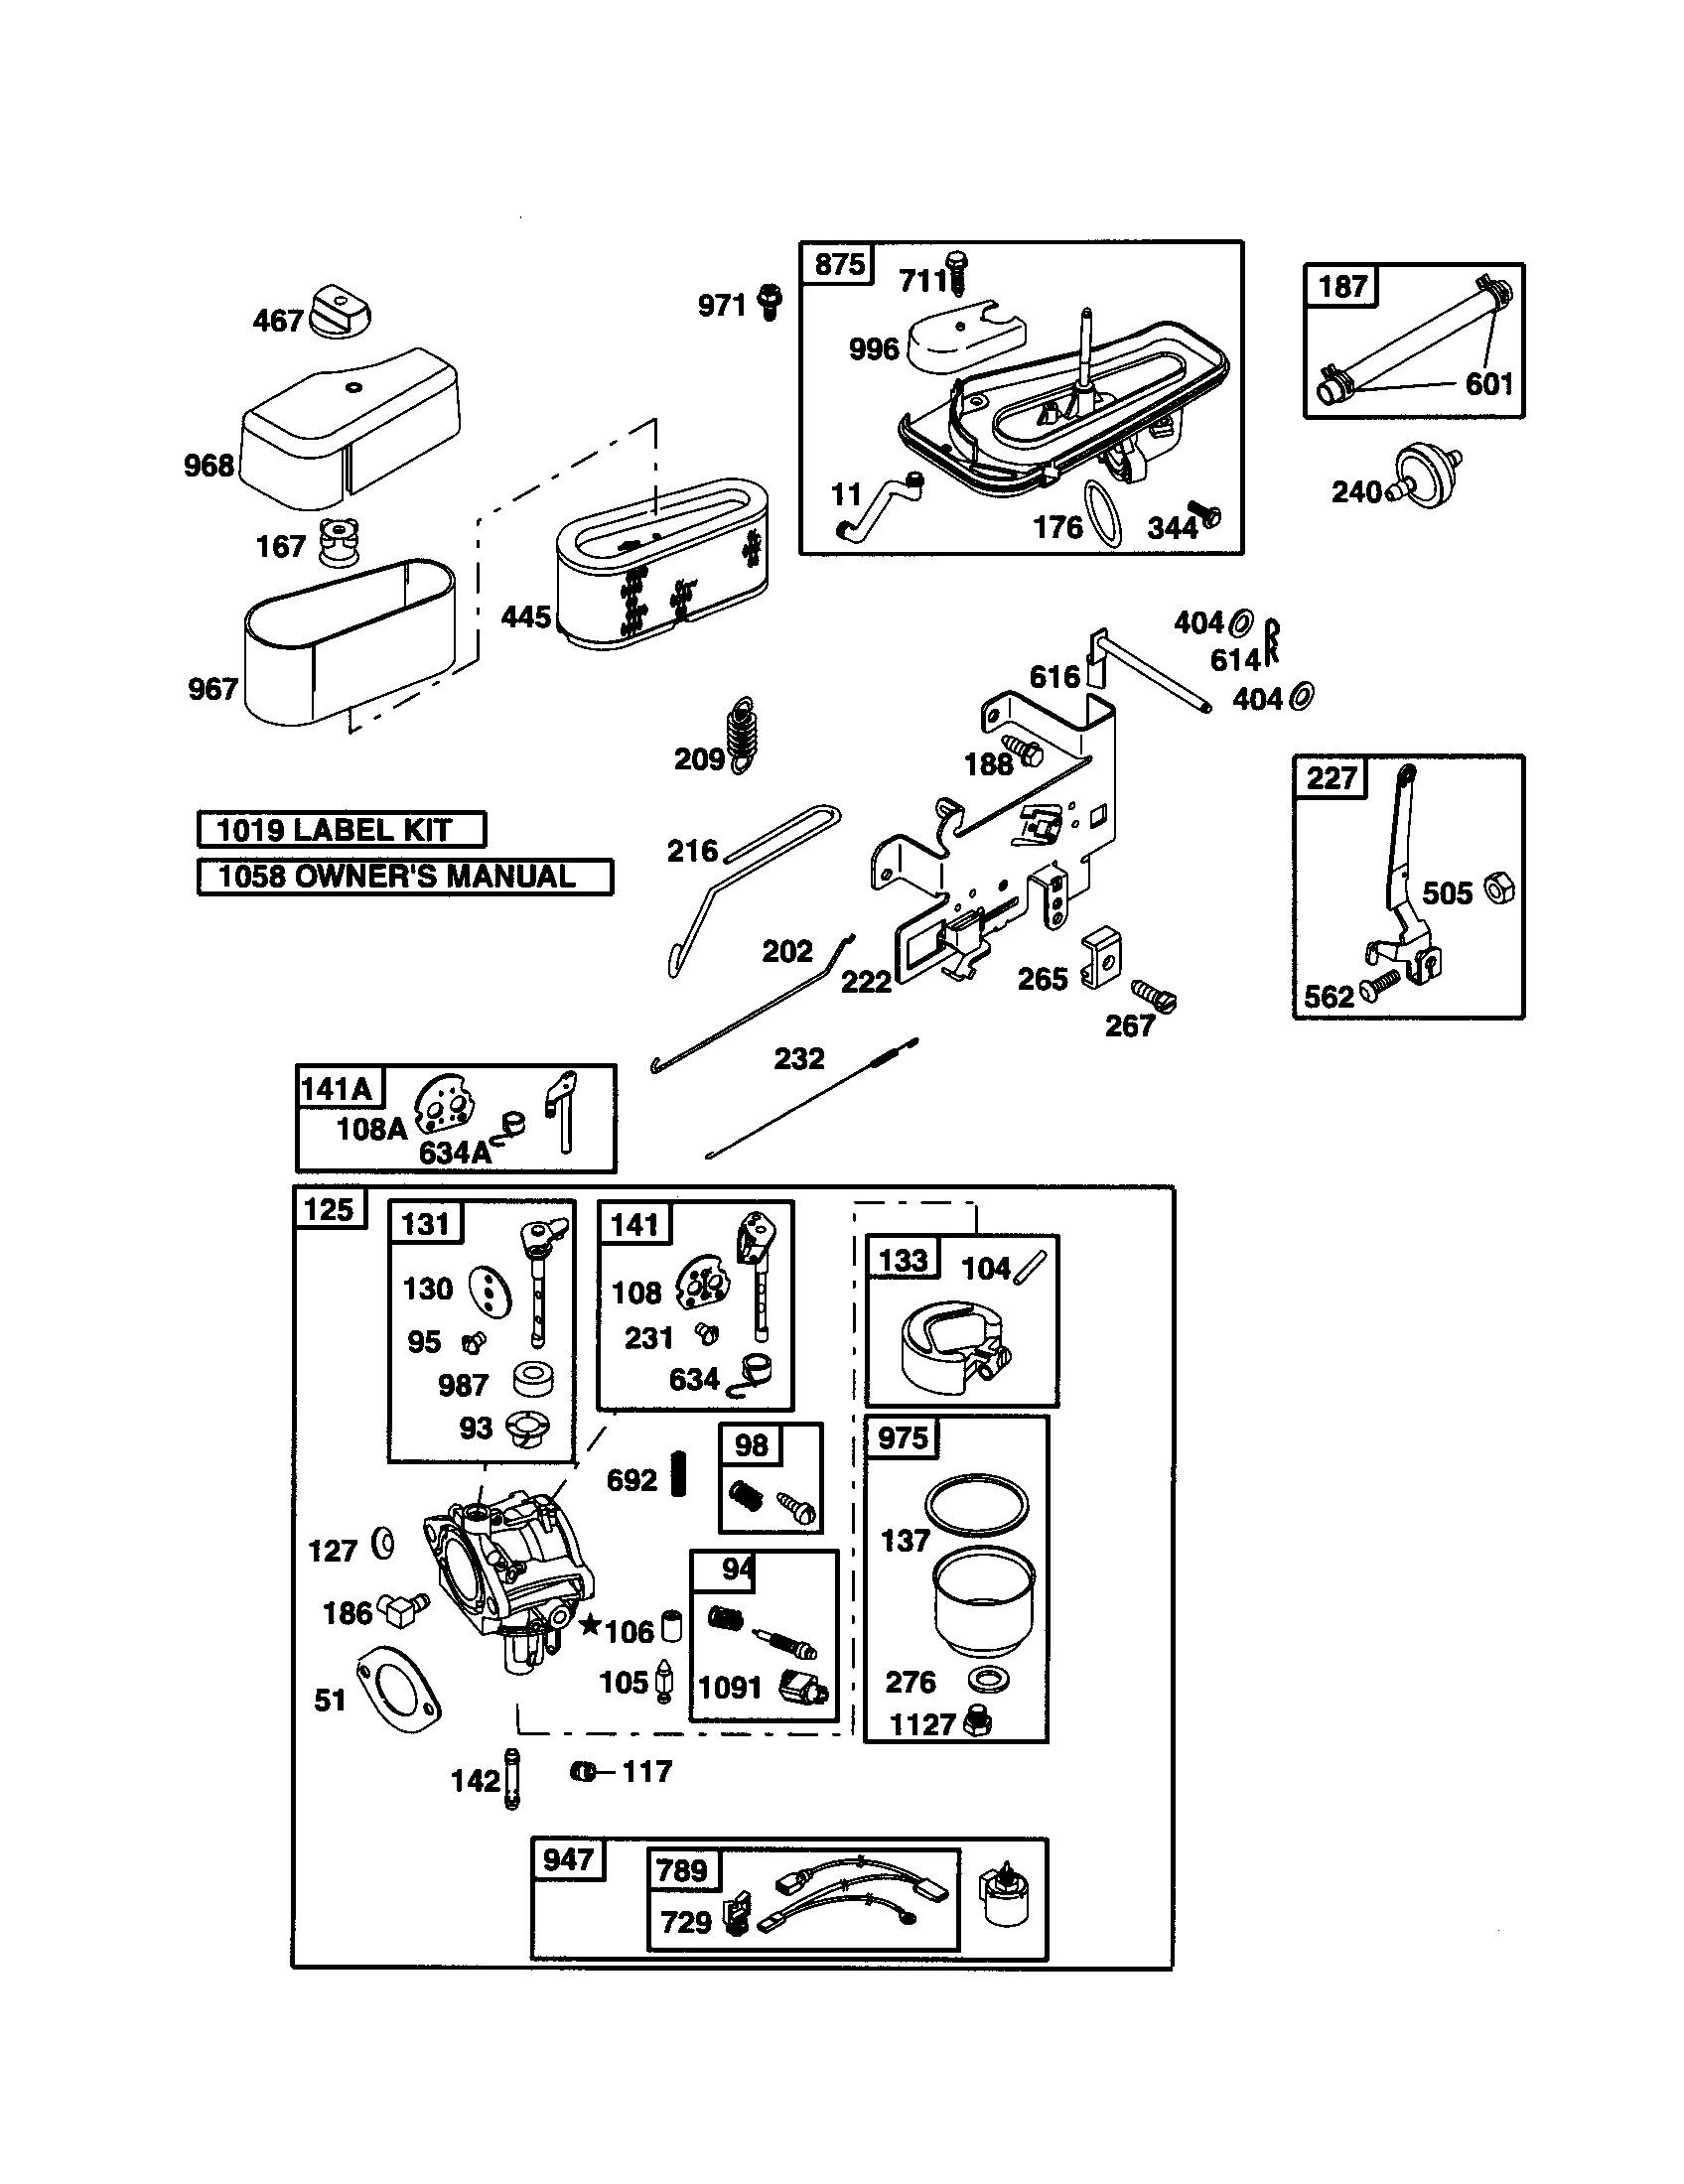 Briggs And Stratton Coil Wiring Diagram